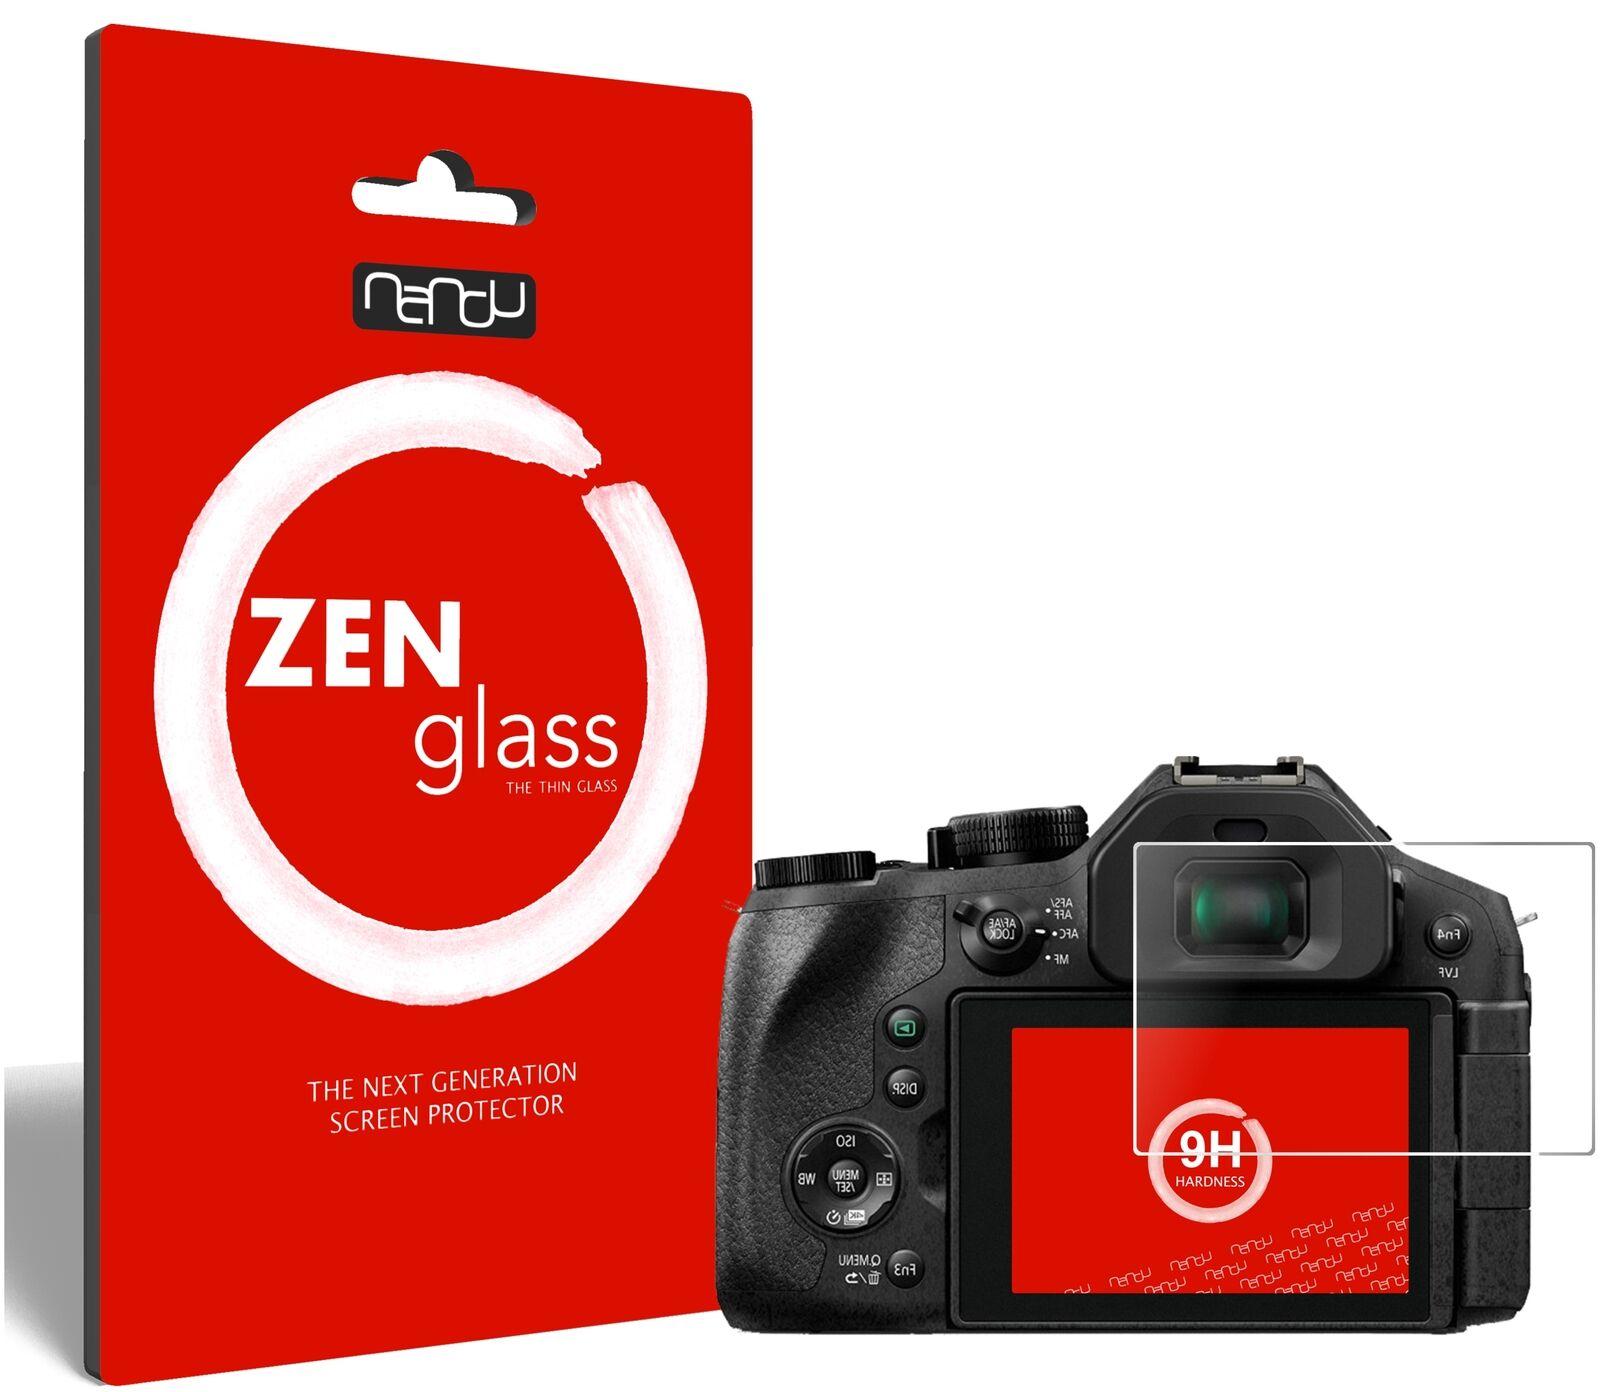 ZenGlass Flexible Glass Film for Panasonic Lumix FZ300 I Screen Protector 9H